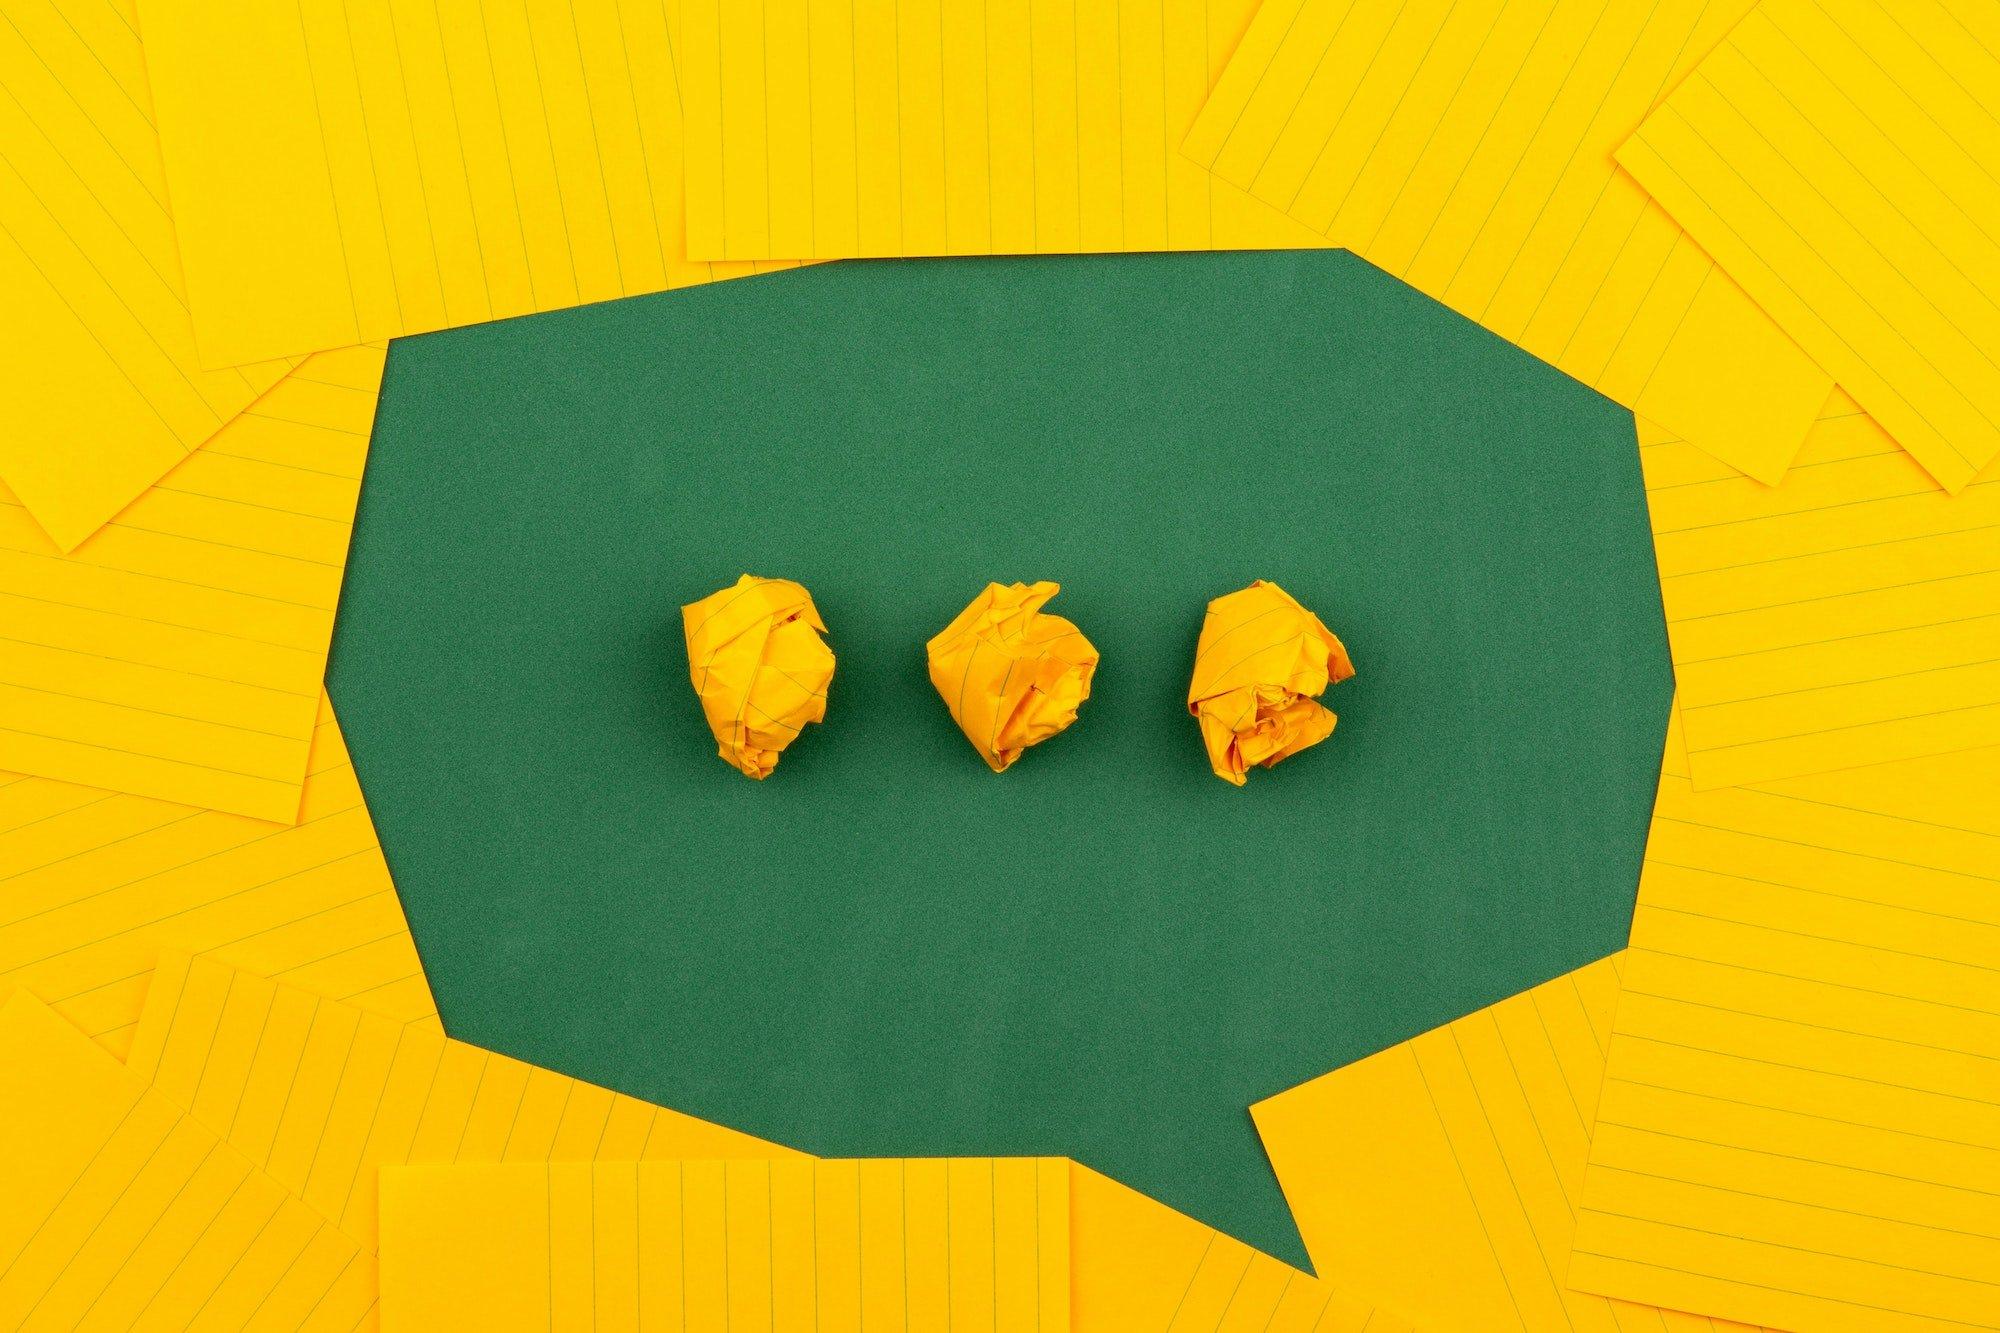 corporate culture communication